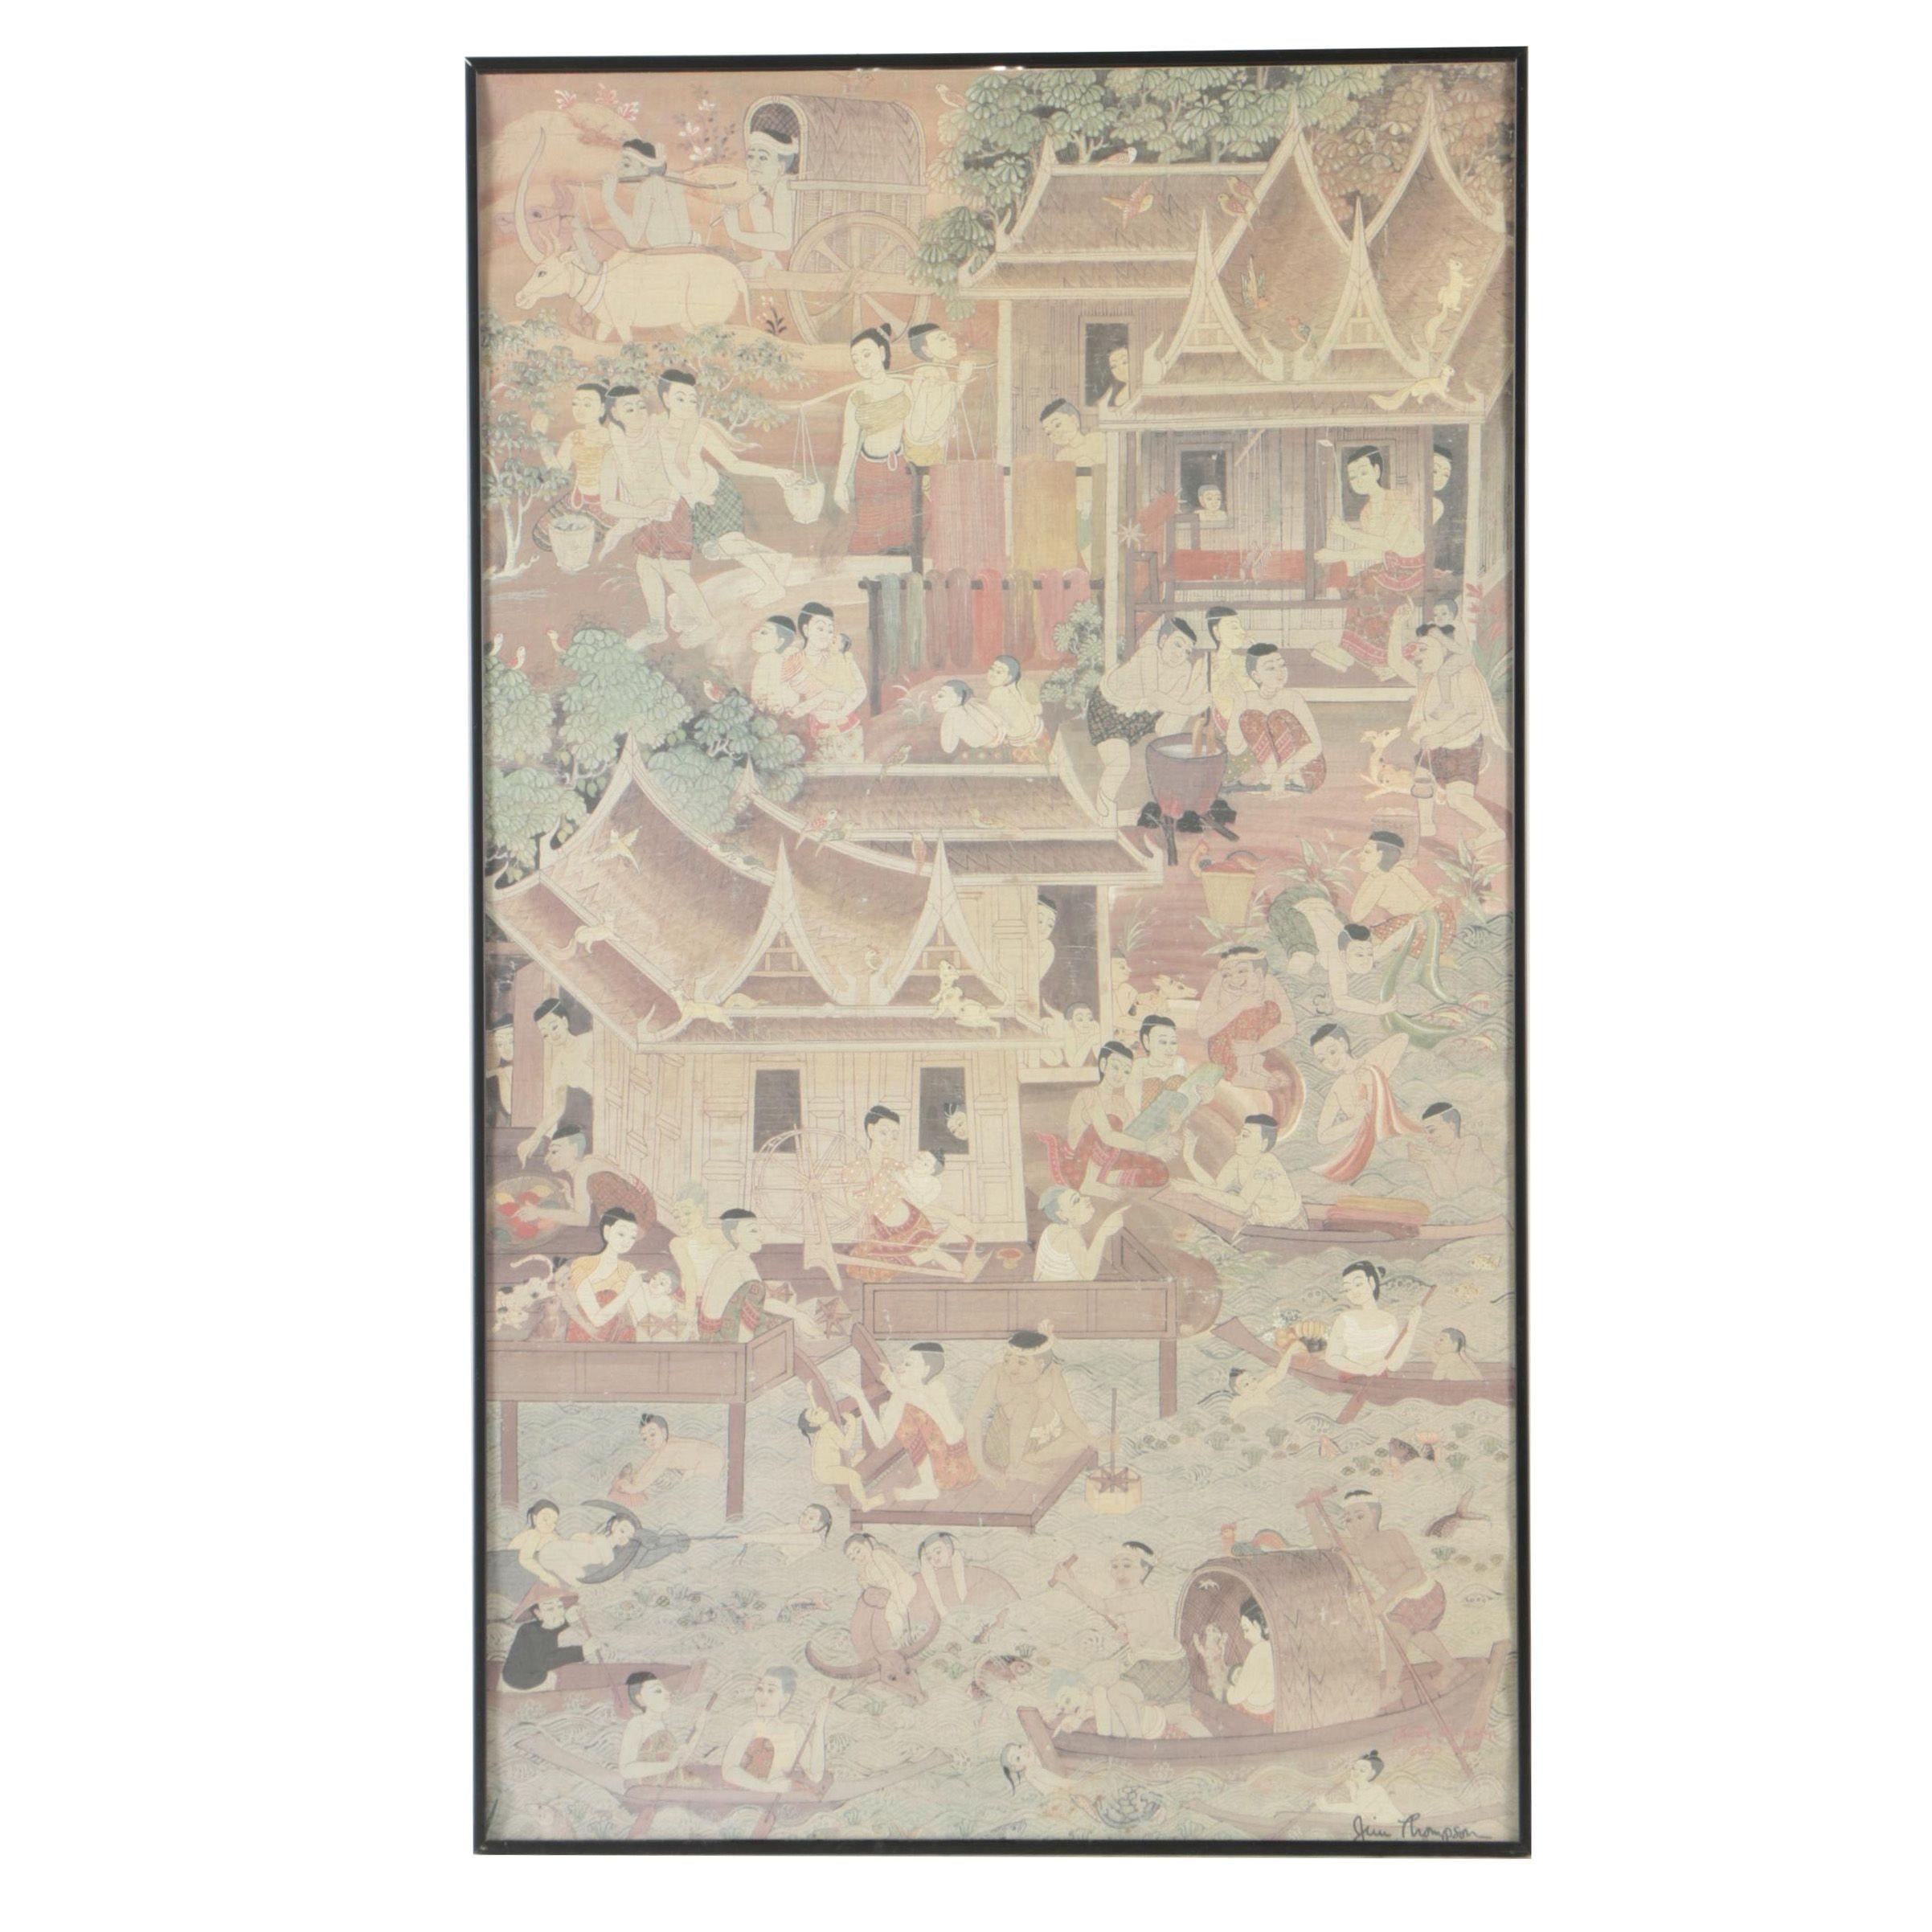 Jim Thompson Offset Lithograph of an Original East Asian Fabric